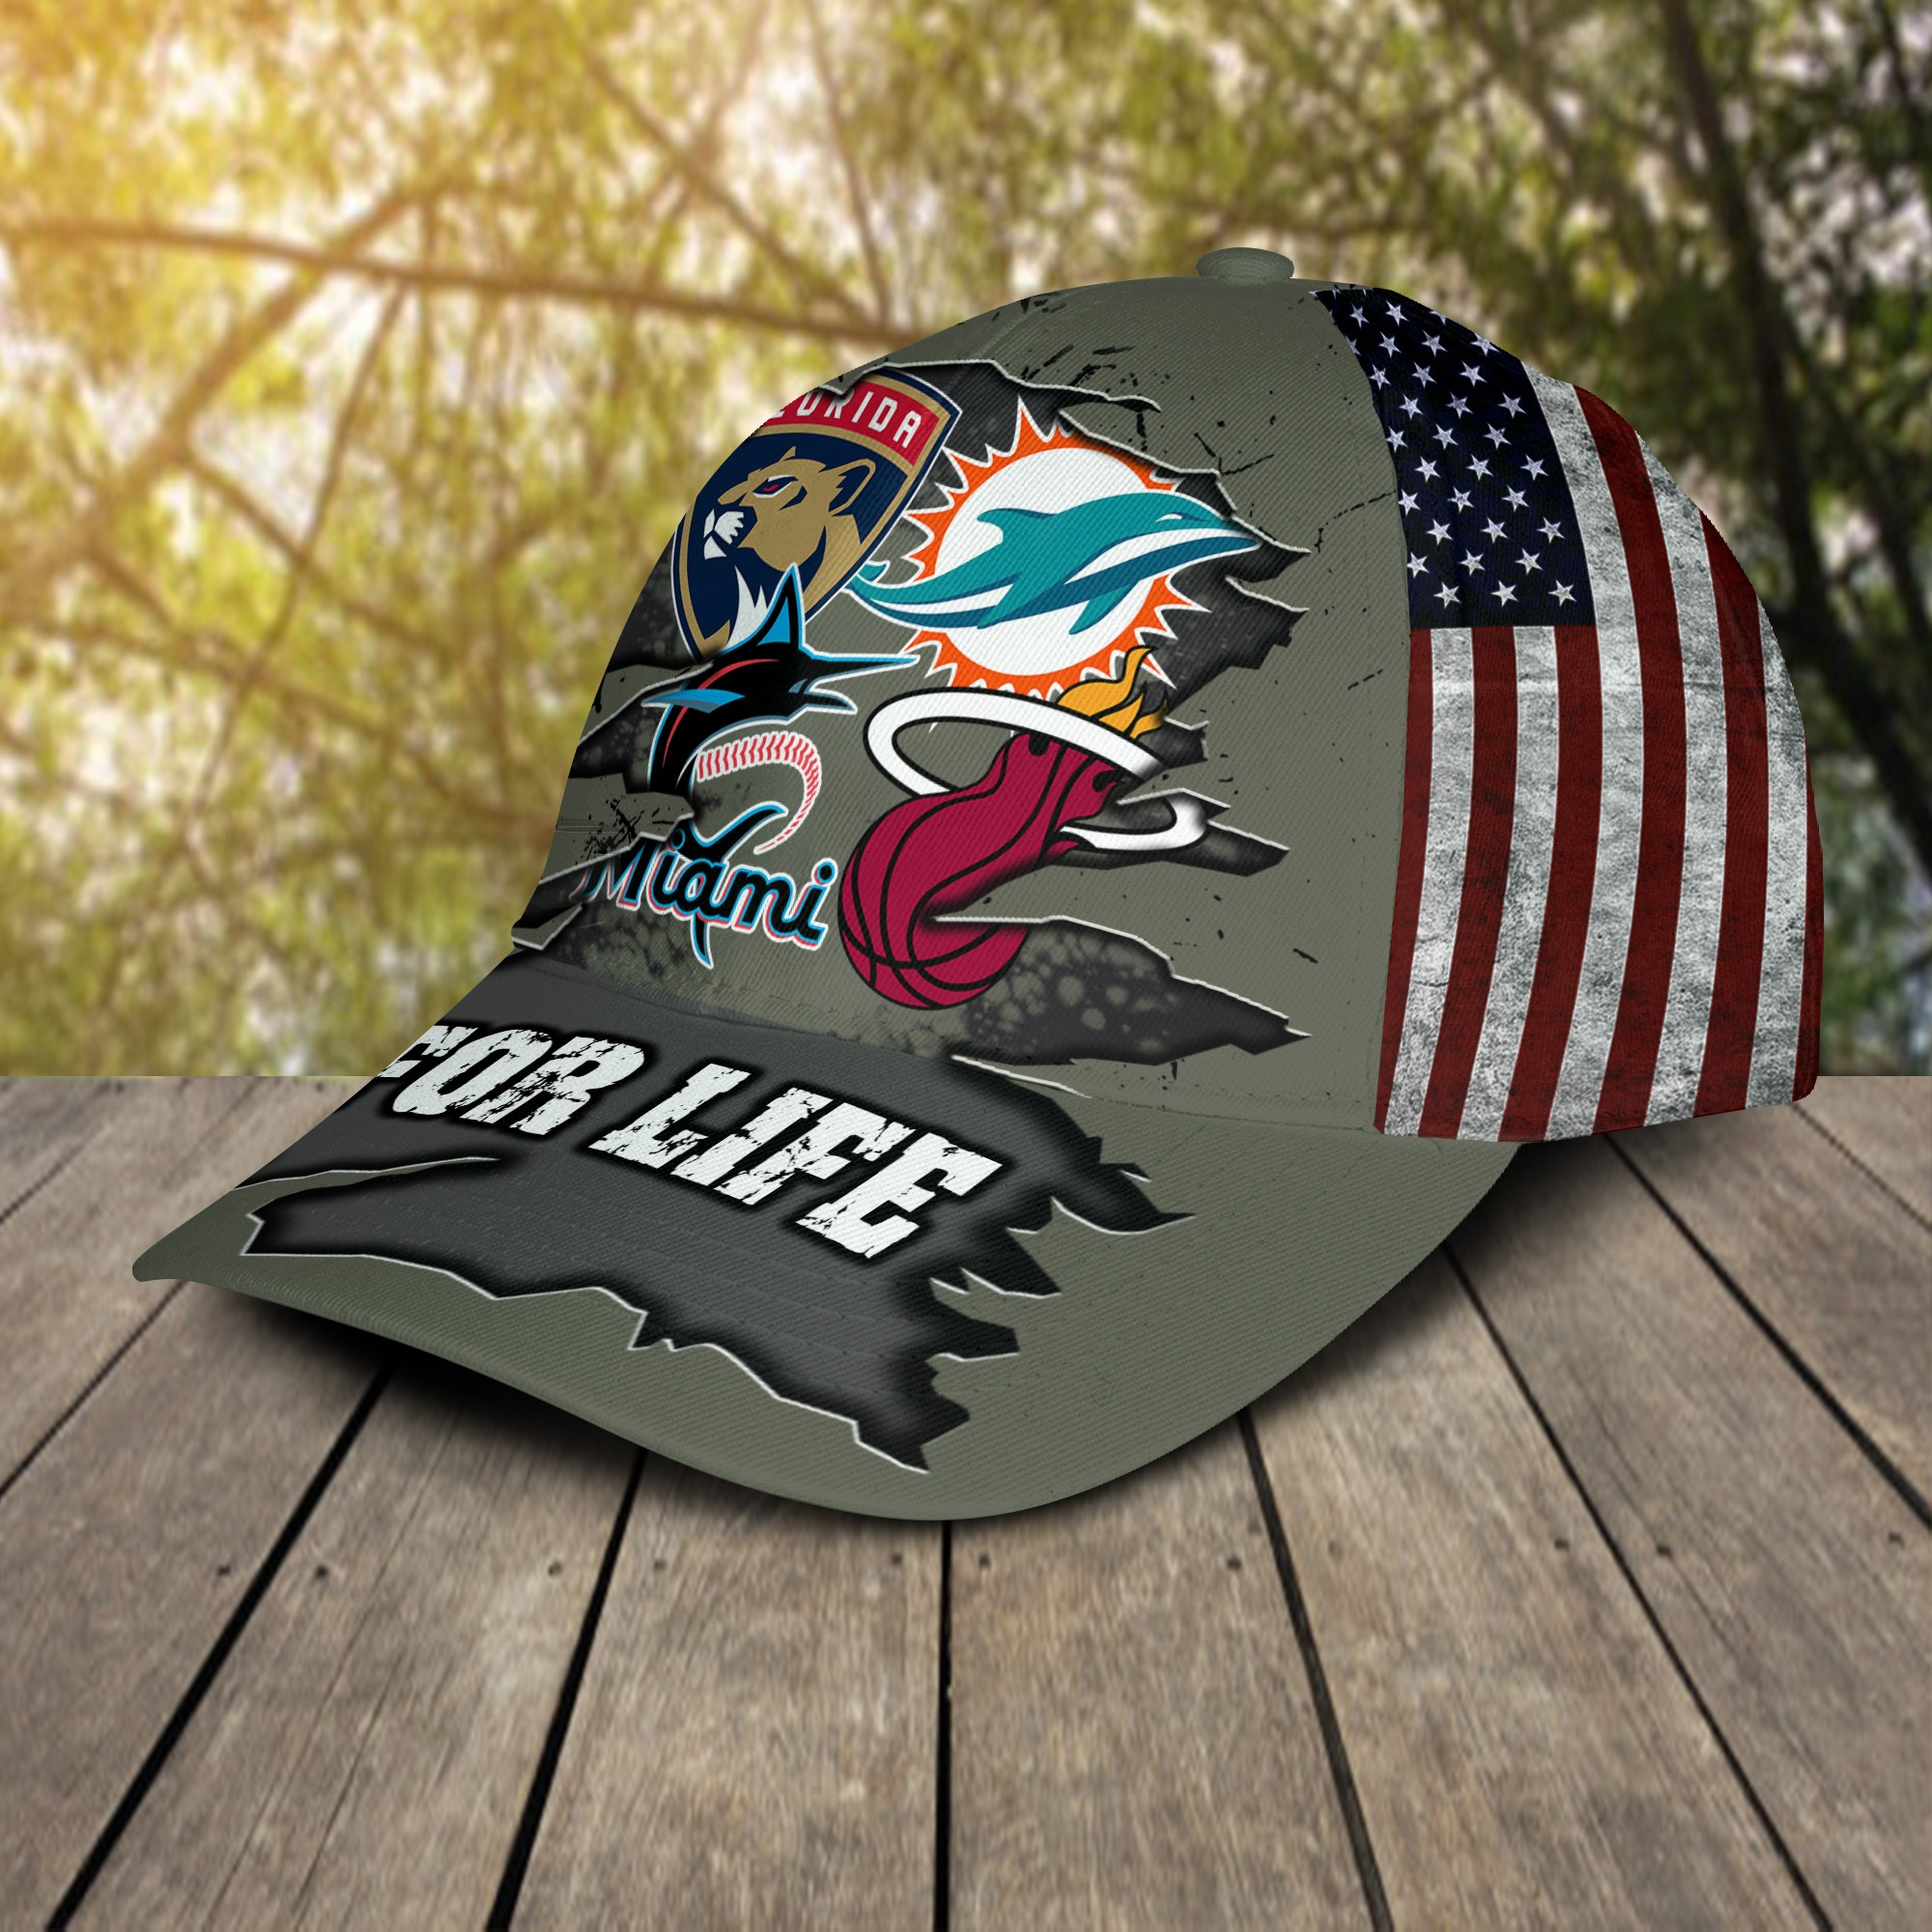 Miami Dolphins Miami Marlins Miami Heat Florida Panthers For Life Cap 2